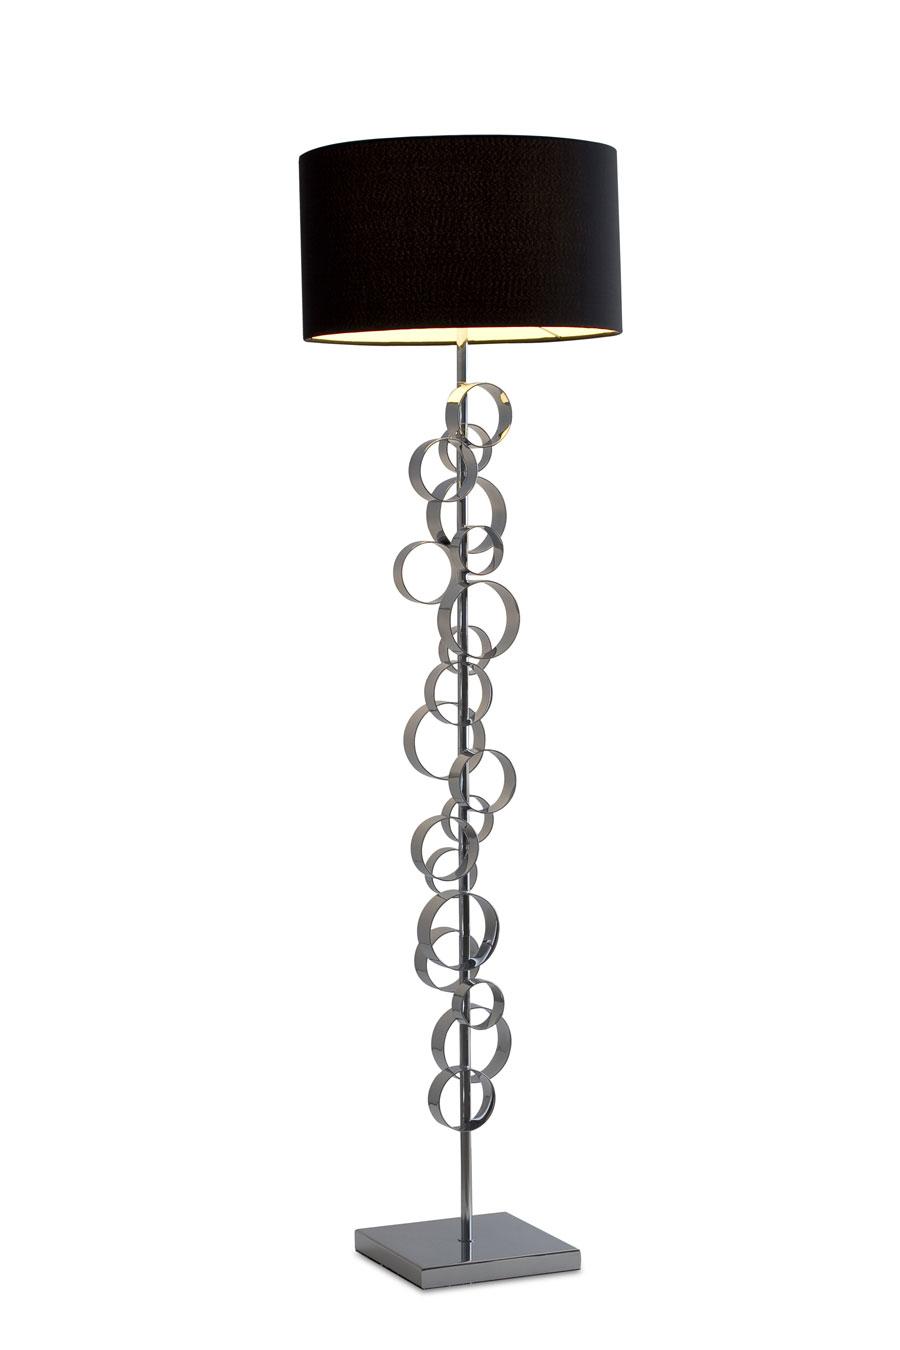 Lyon   Chrome And Black Designer Standard Lamp With Bubble Like Circles .  Faro.